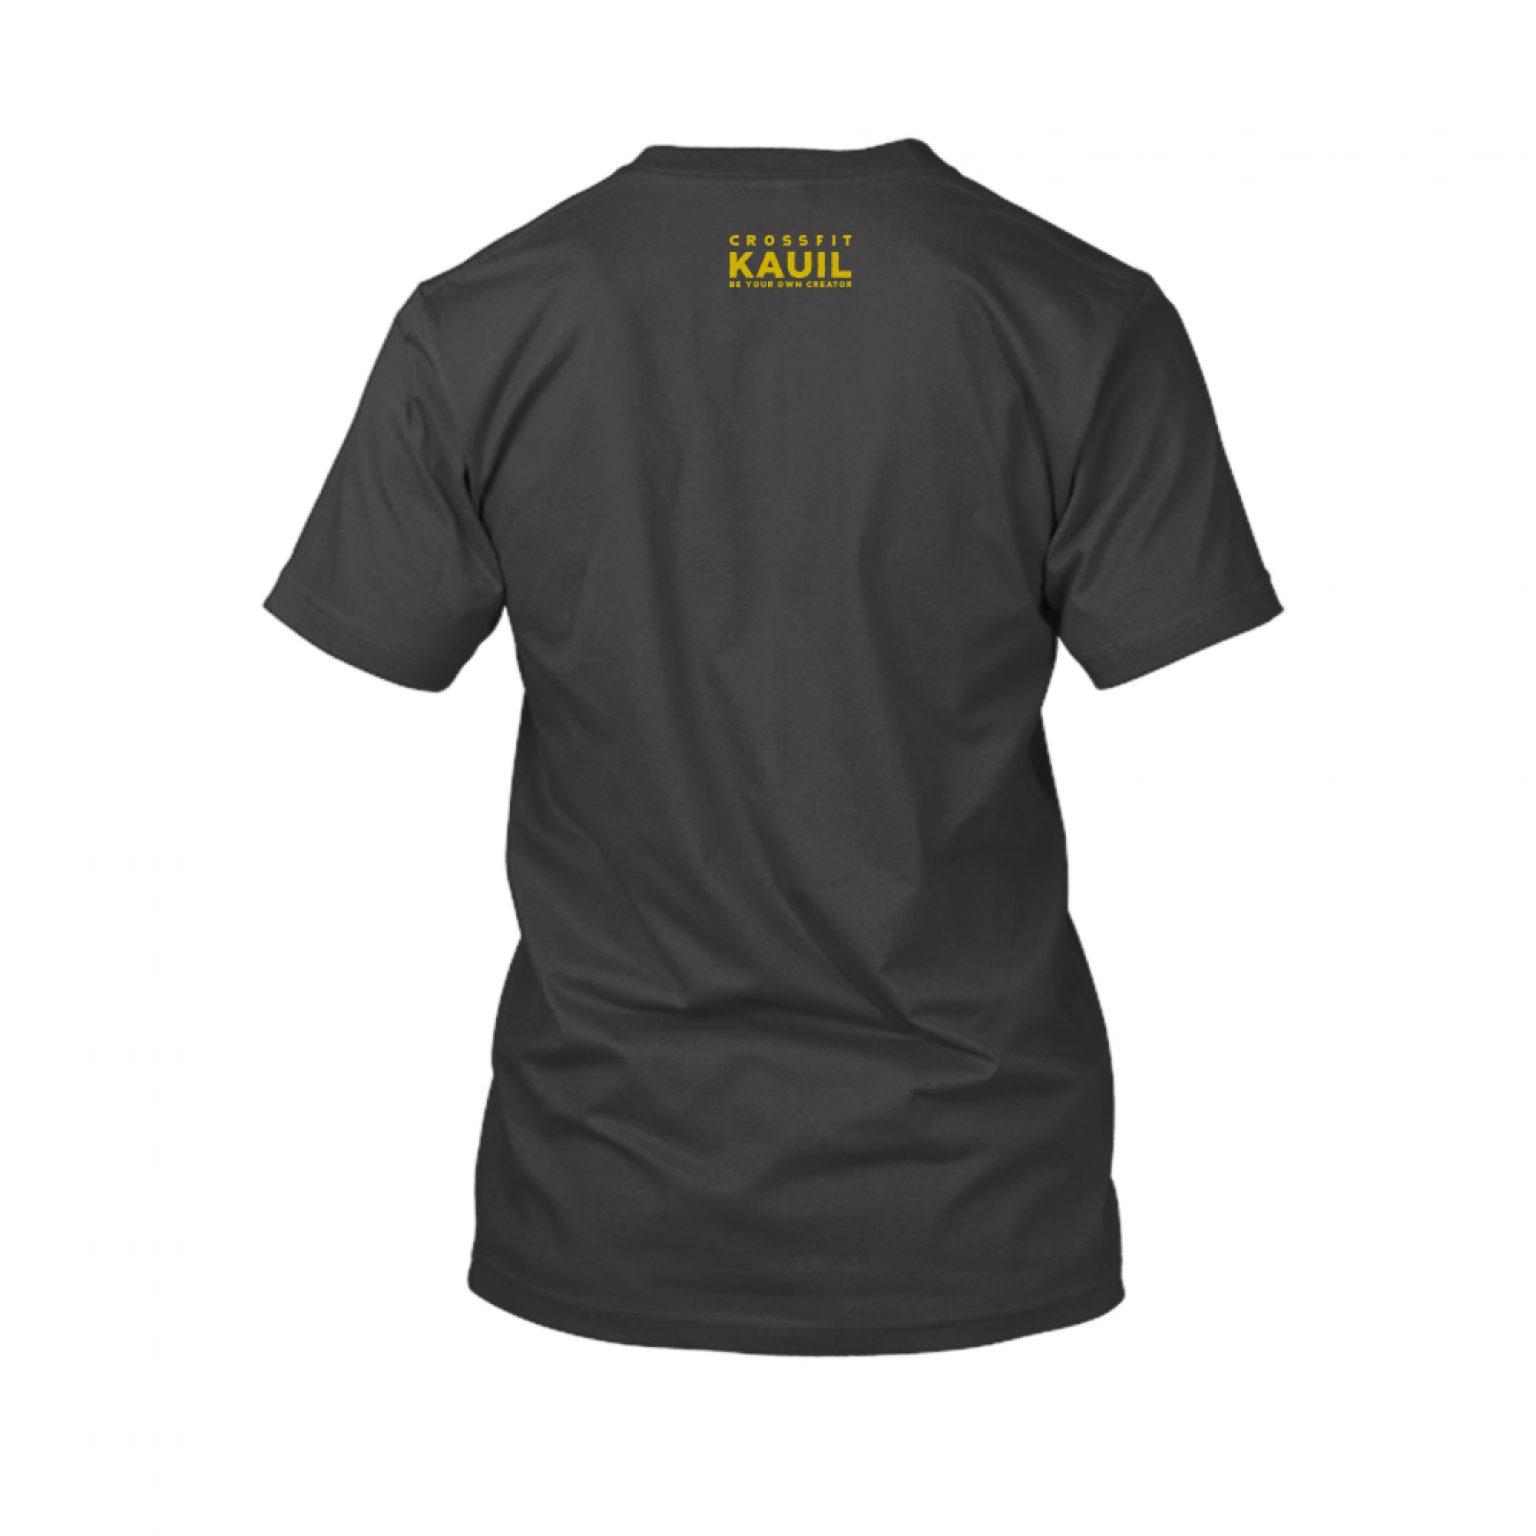 Herren Shirt Schwarz1 gold back